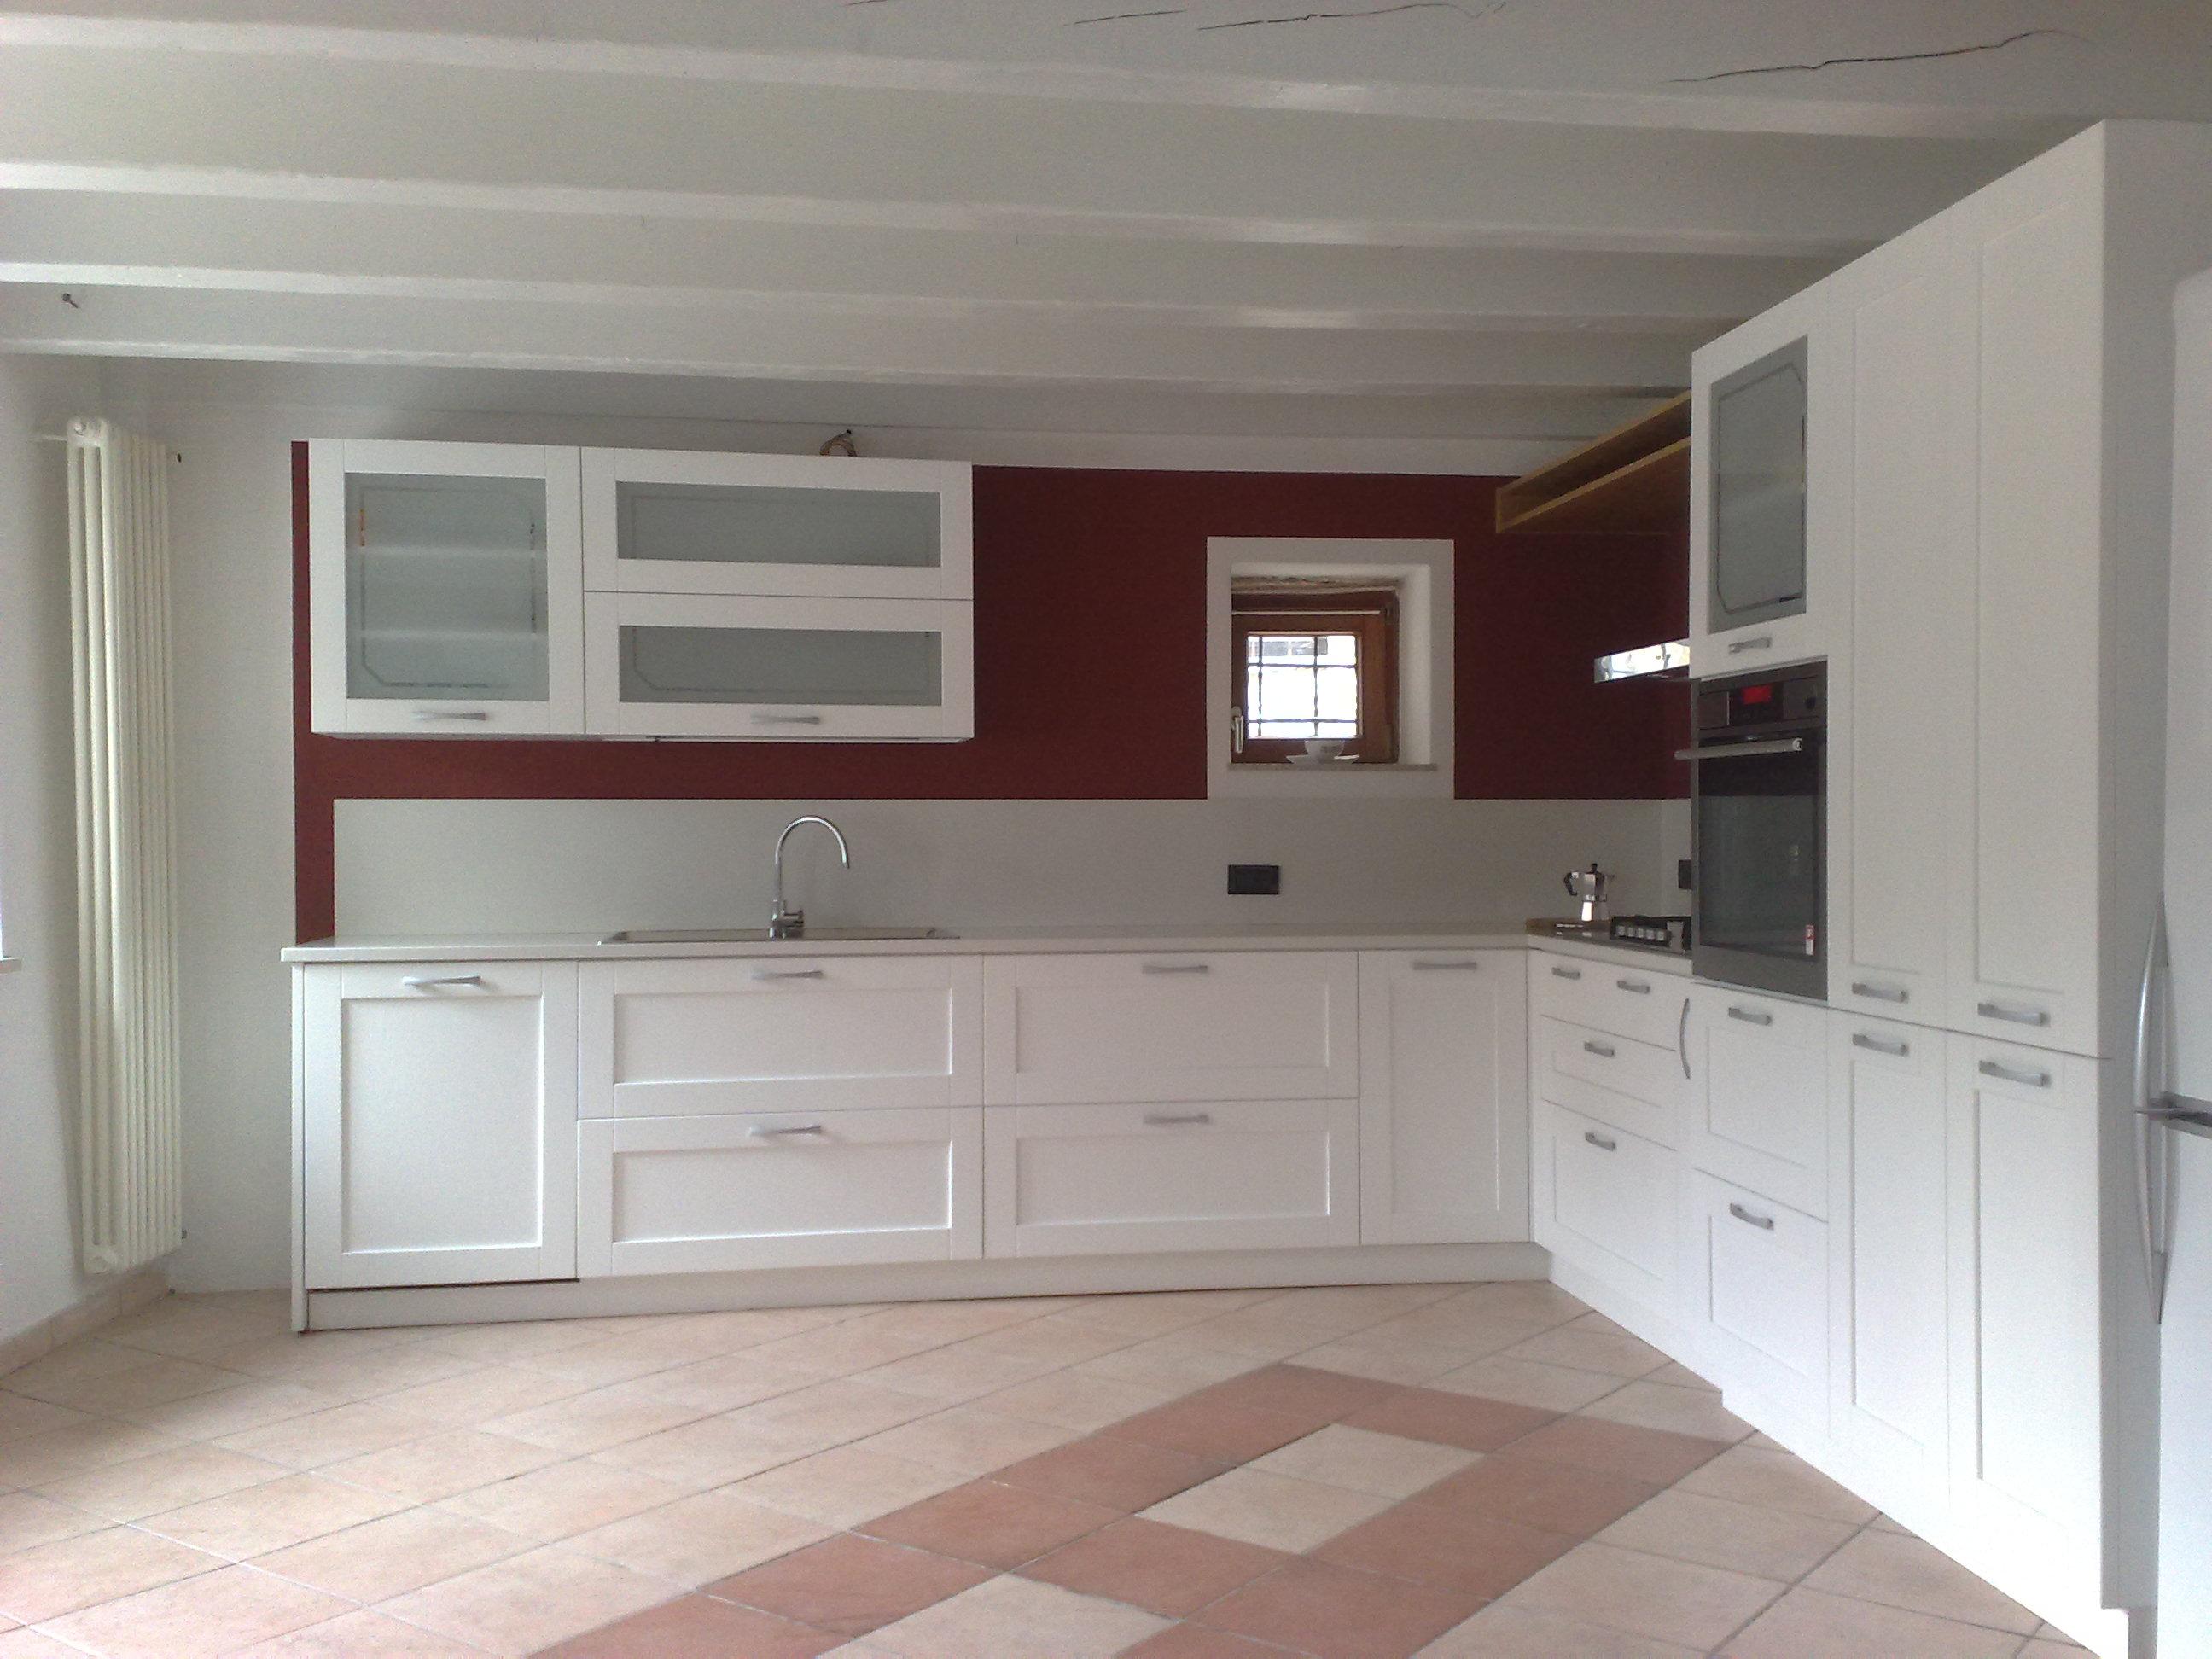 Arredamenti Fazion  Cucine rustiche, country e moderne